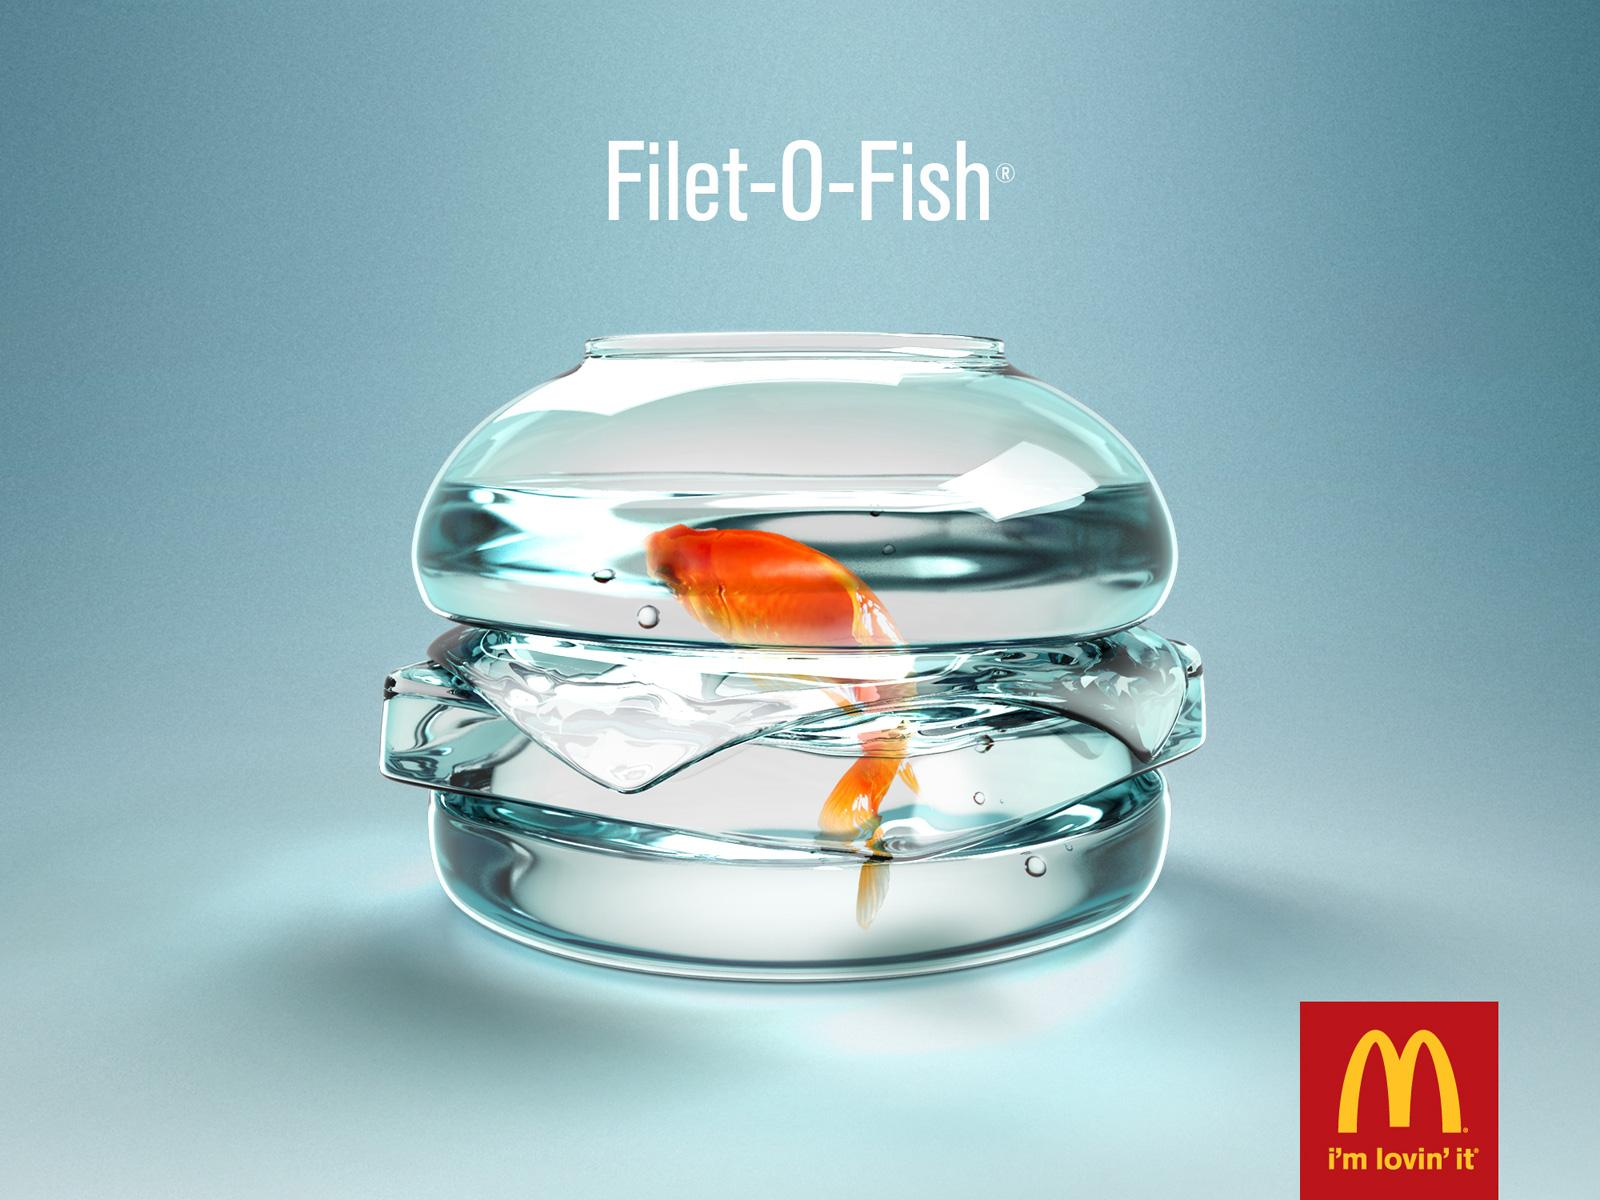 20 anuncios creativos minimalistas paperblog for Filet o fish mcdonalds